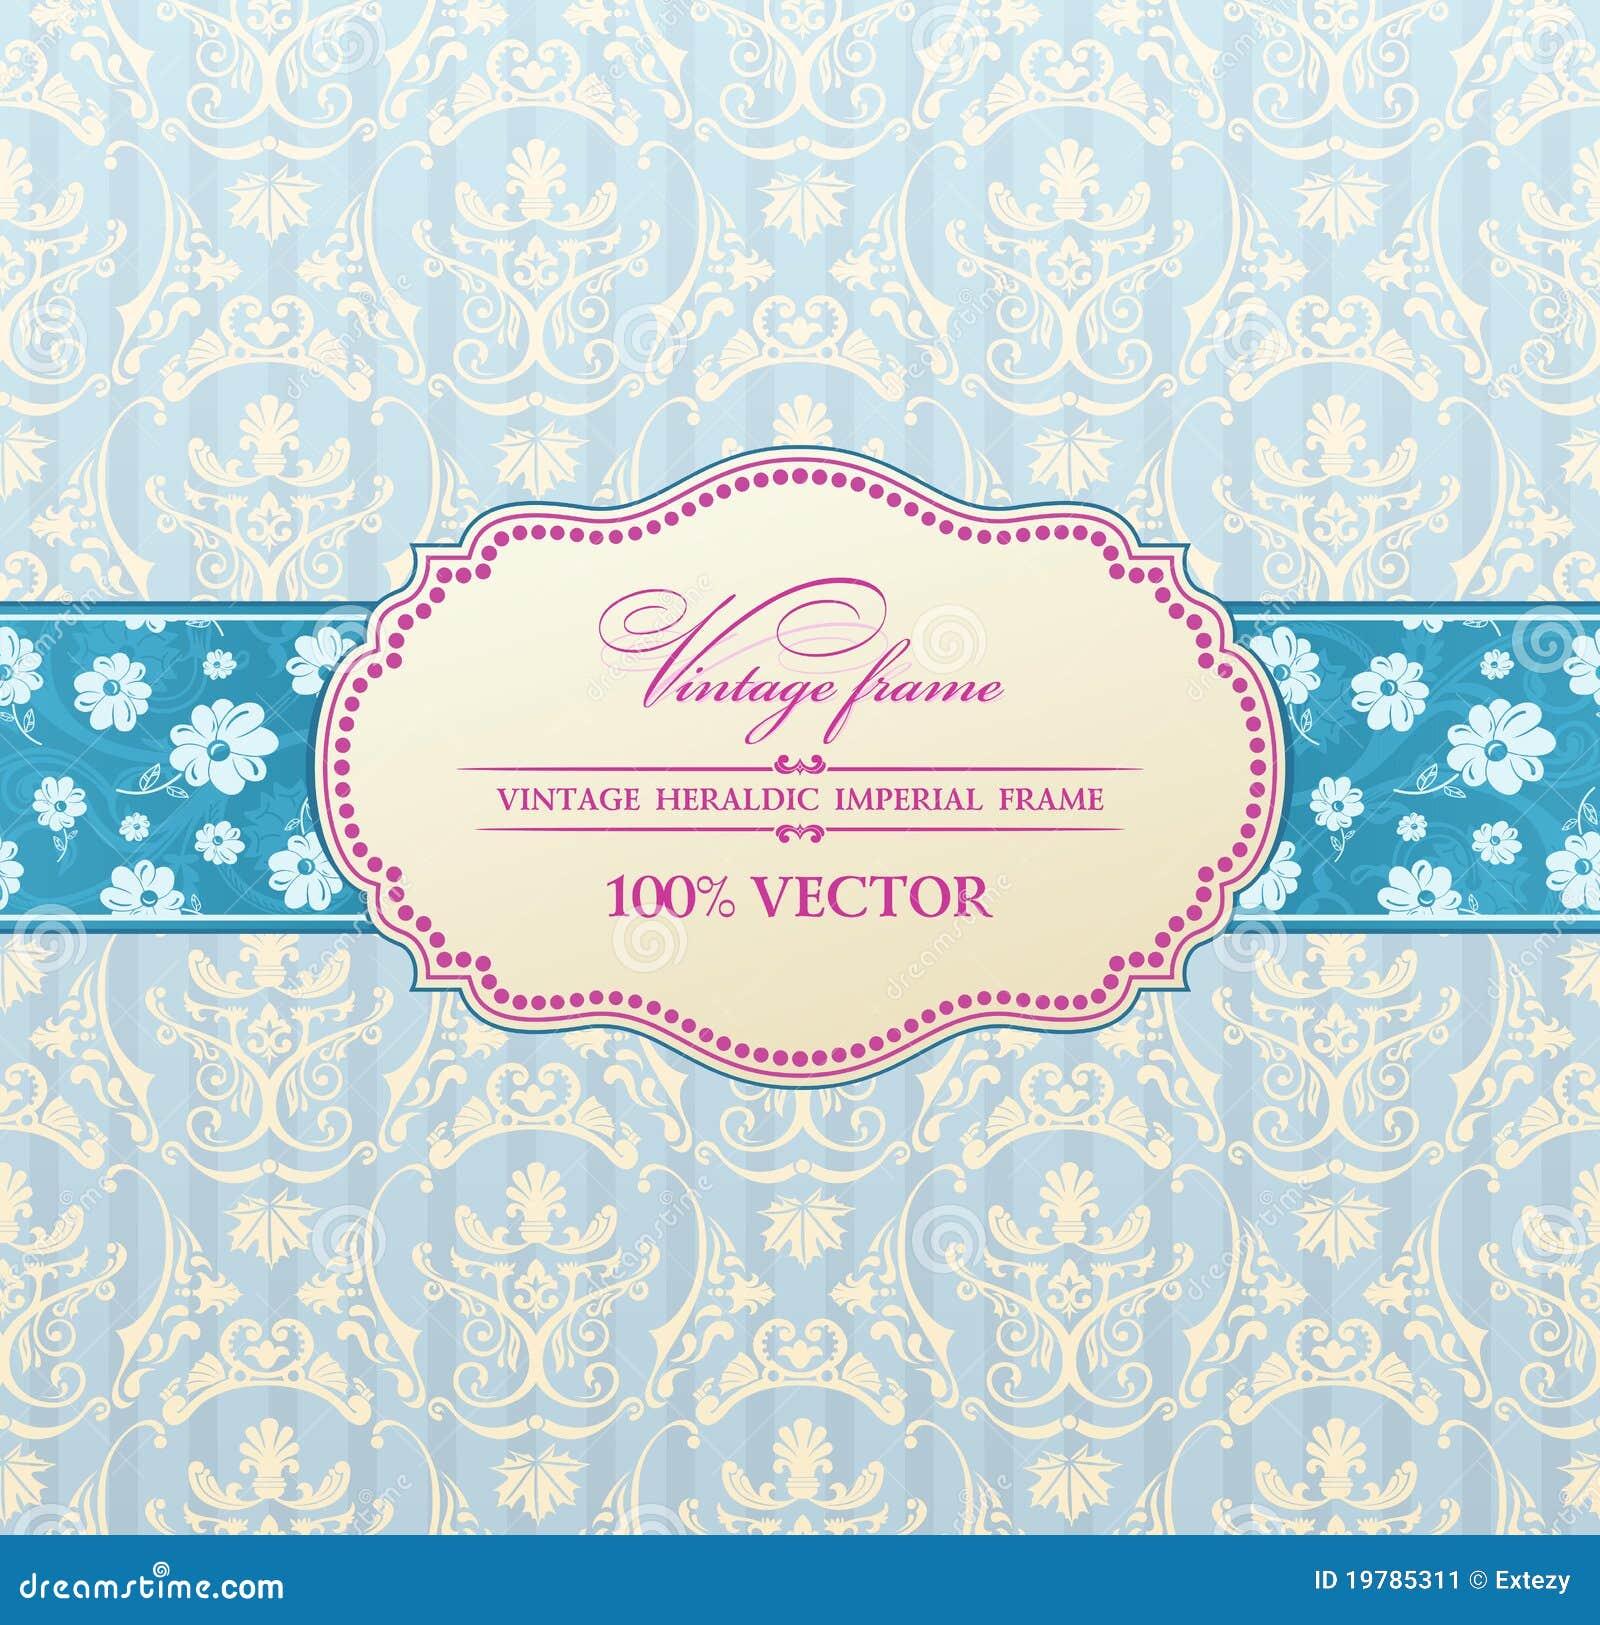 4 X 6 Invitation Template is beautiful invitations template